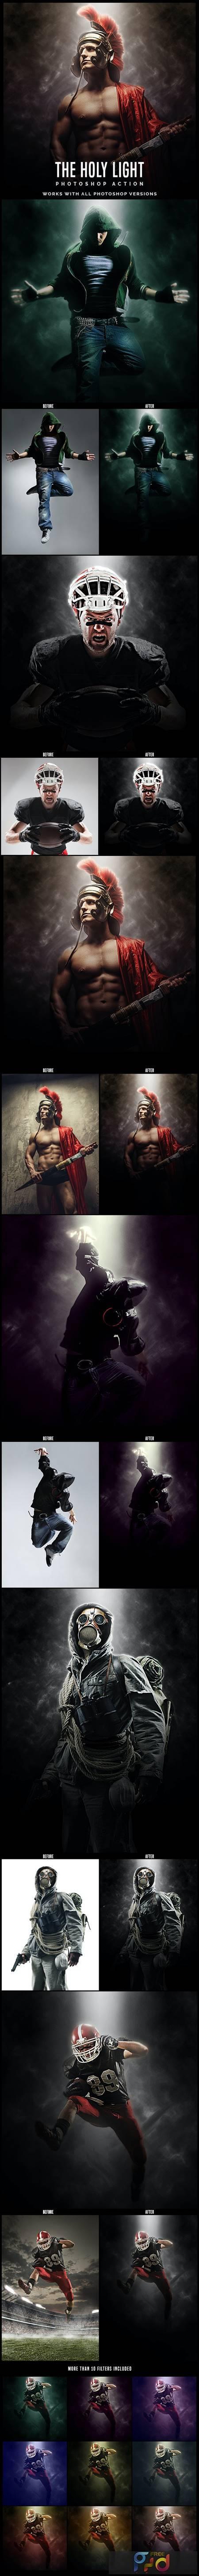 The Holy Light - Premium Photoshop Action 26637458 1